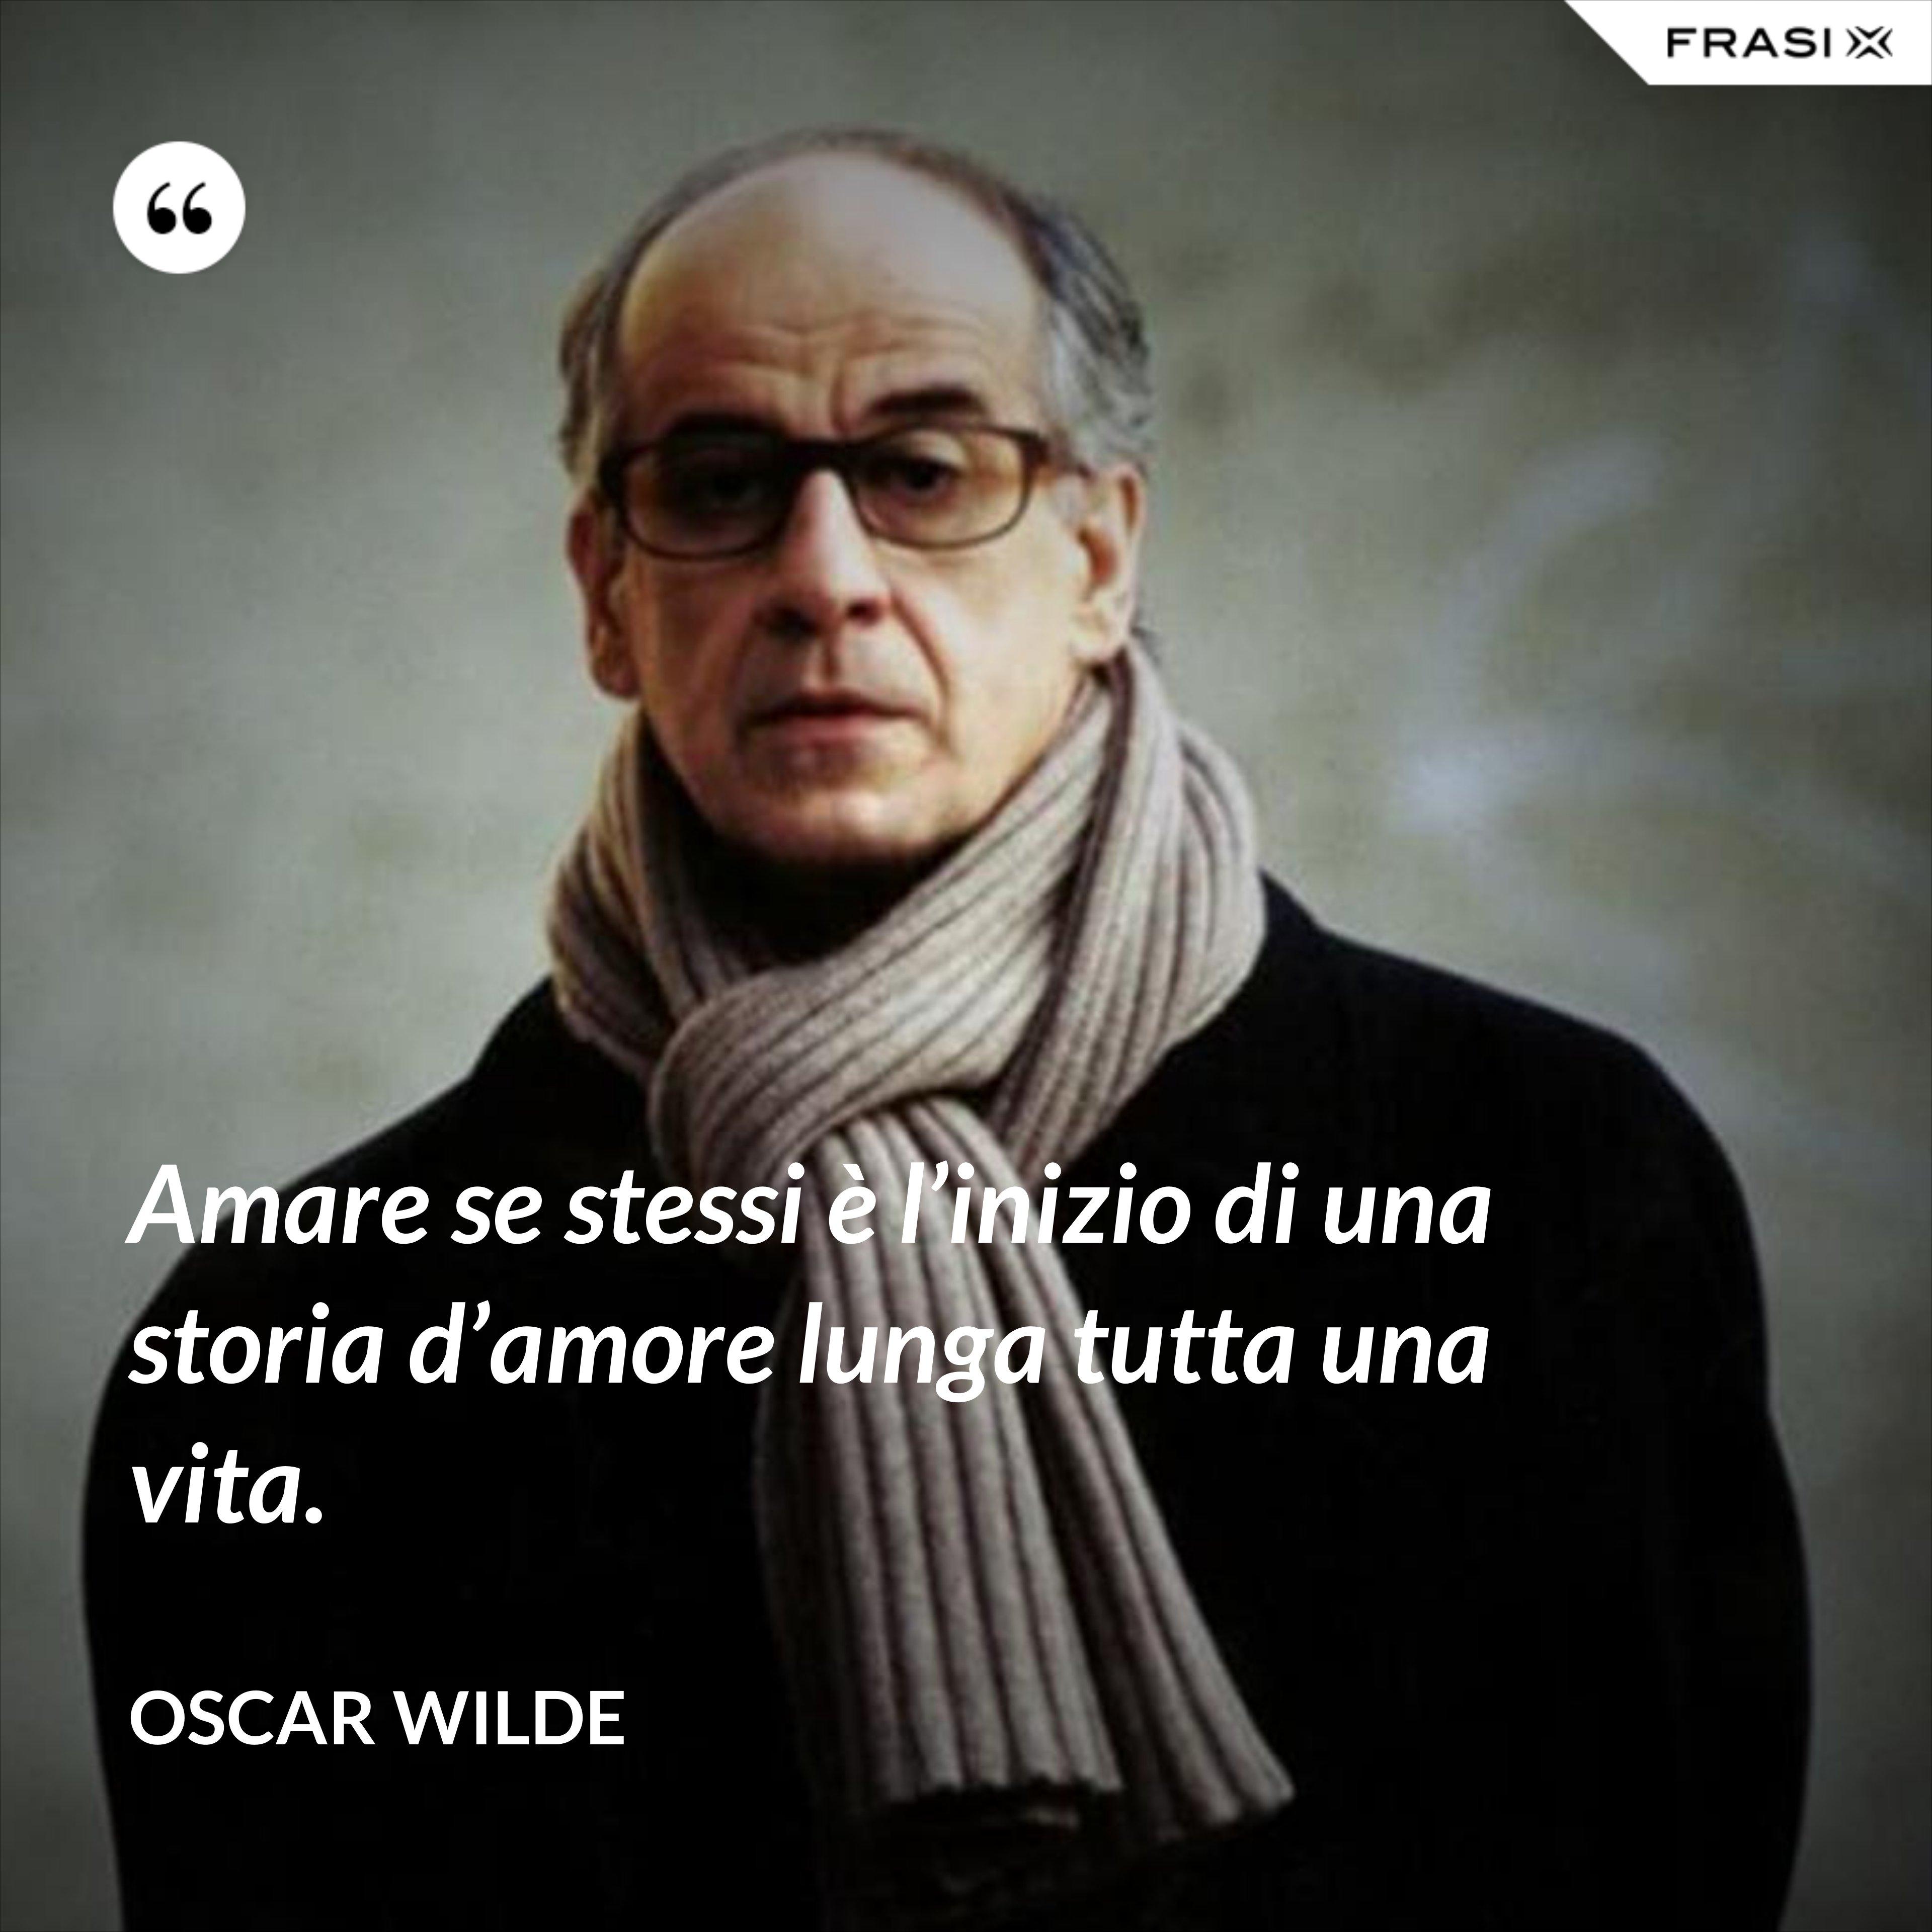 Amare se stessi è l'inizio di una storia d'amore lunga tutta una vita. - Oscar Wilde